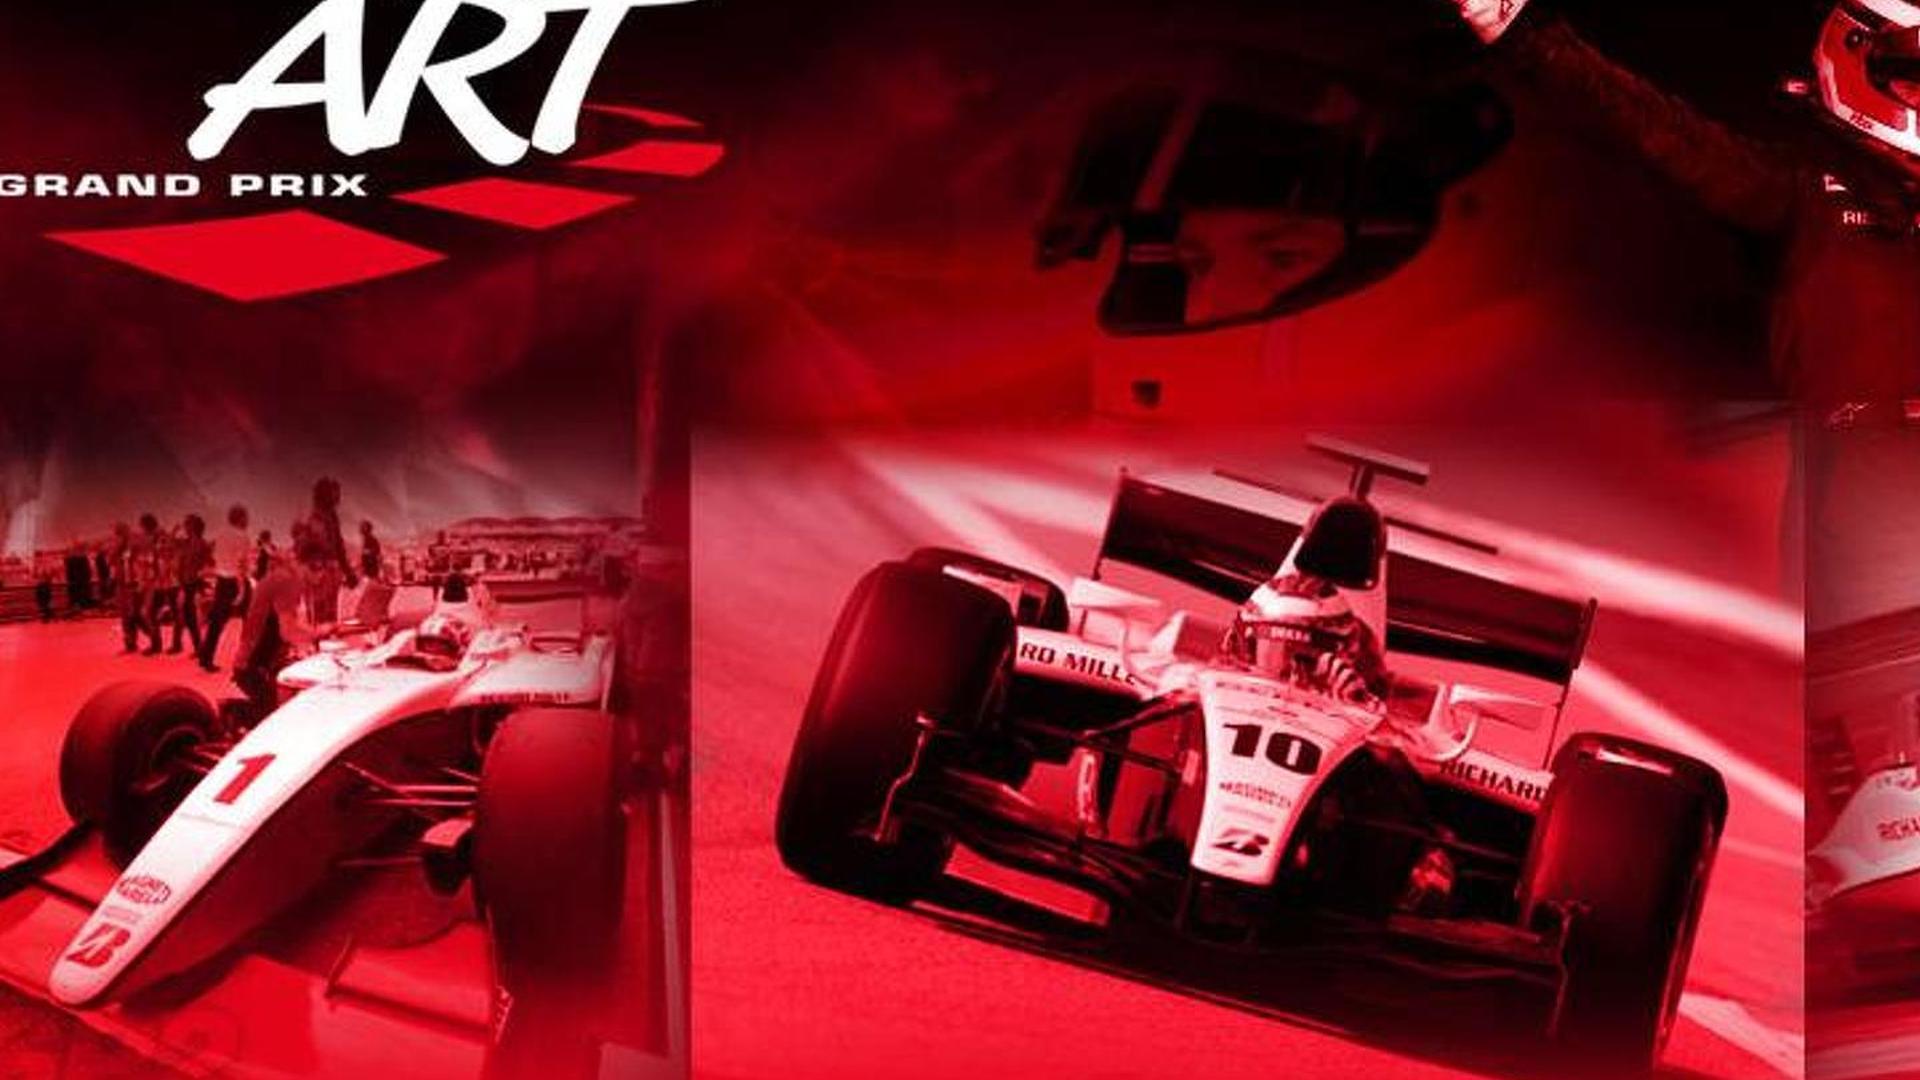 GP2 team ART withdraws bid for 2011 F1 debut